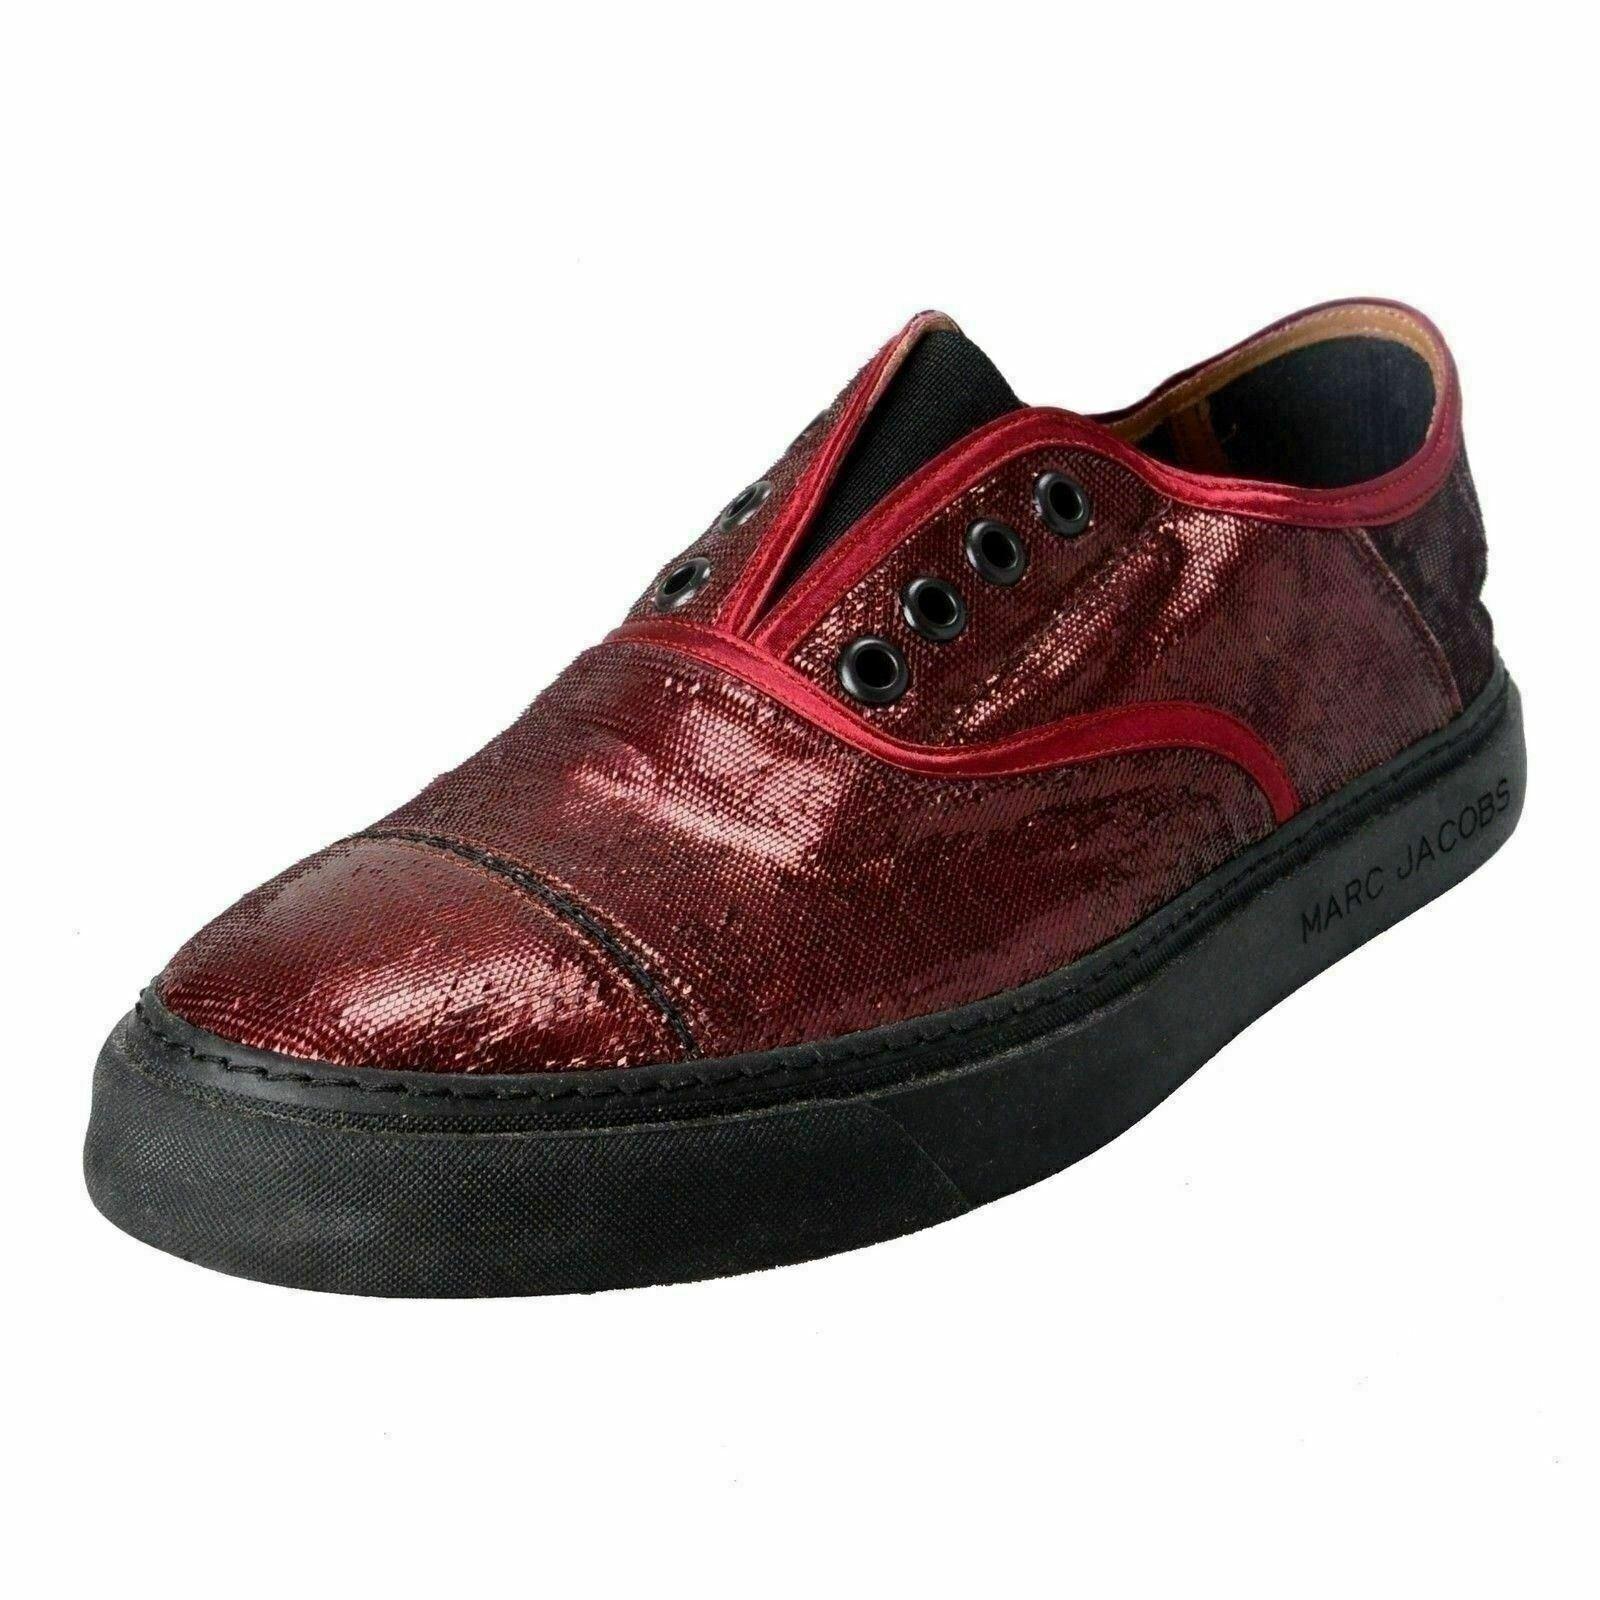 Marc Jacobs Men's Vine Sparkle Leather Loafers Slip On scarpe US 10 IT 9 EU 43